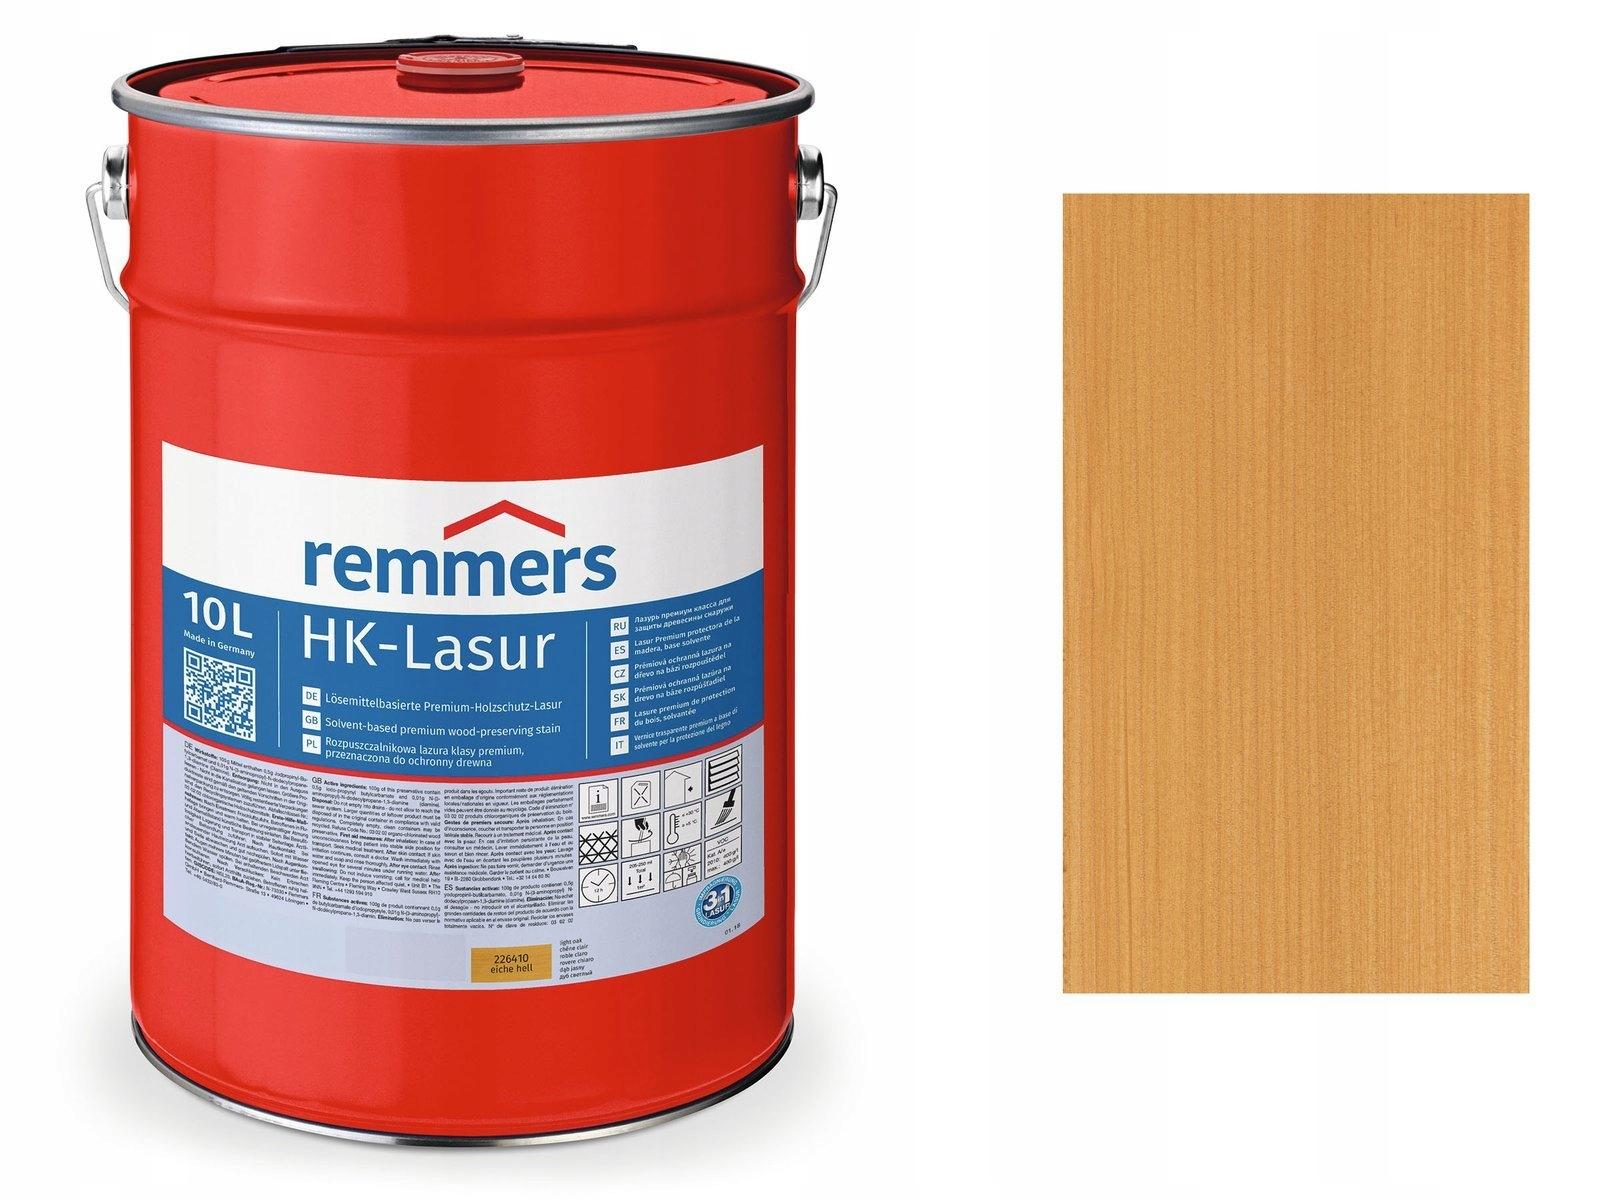 Remmers HK Lasur пропитка для дерева 10L LIGHT OAK